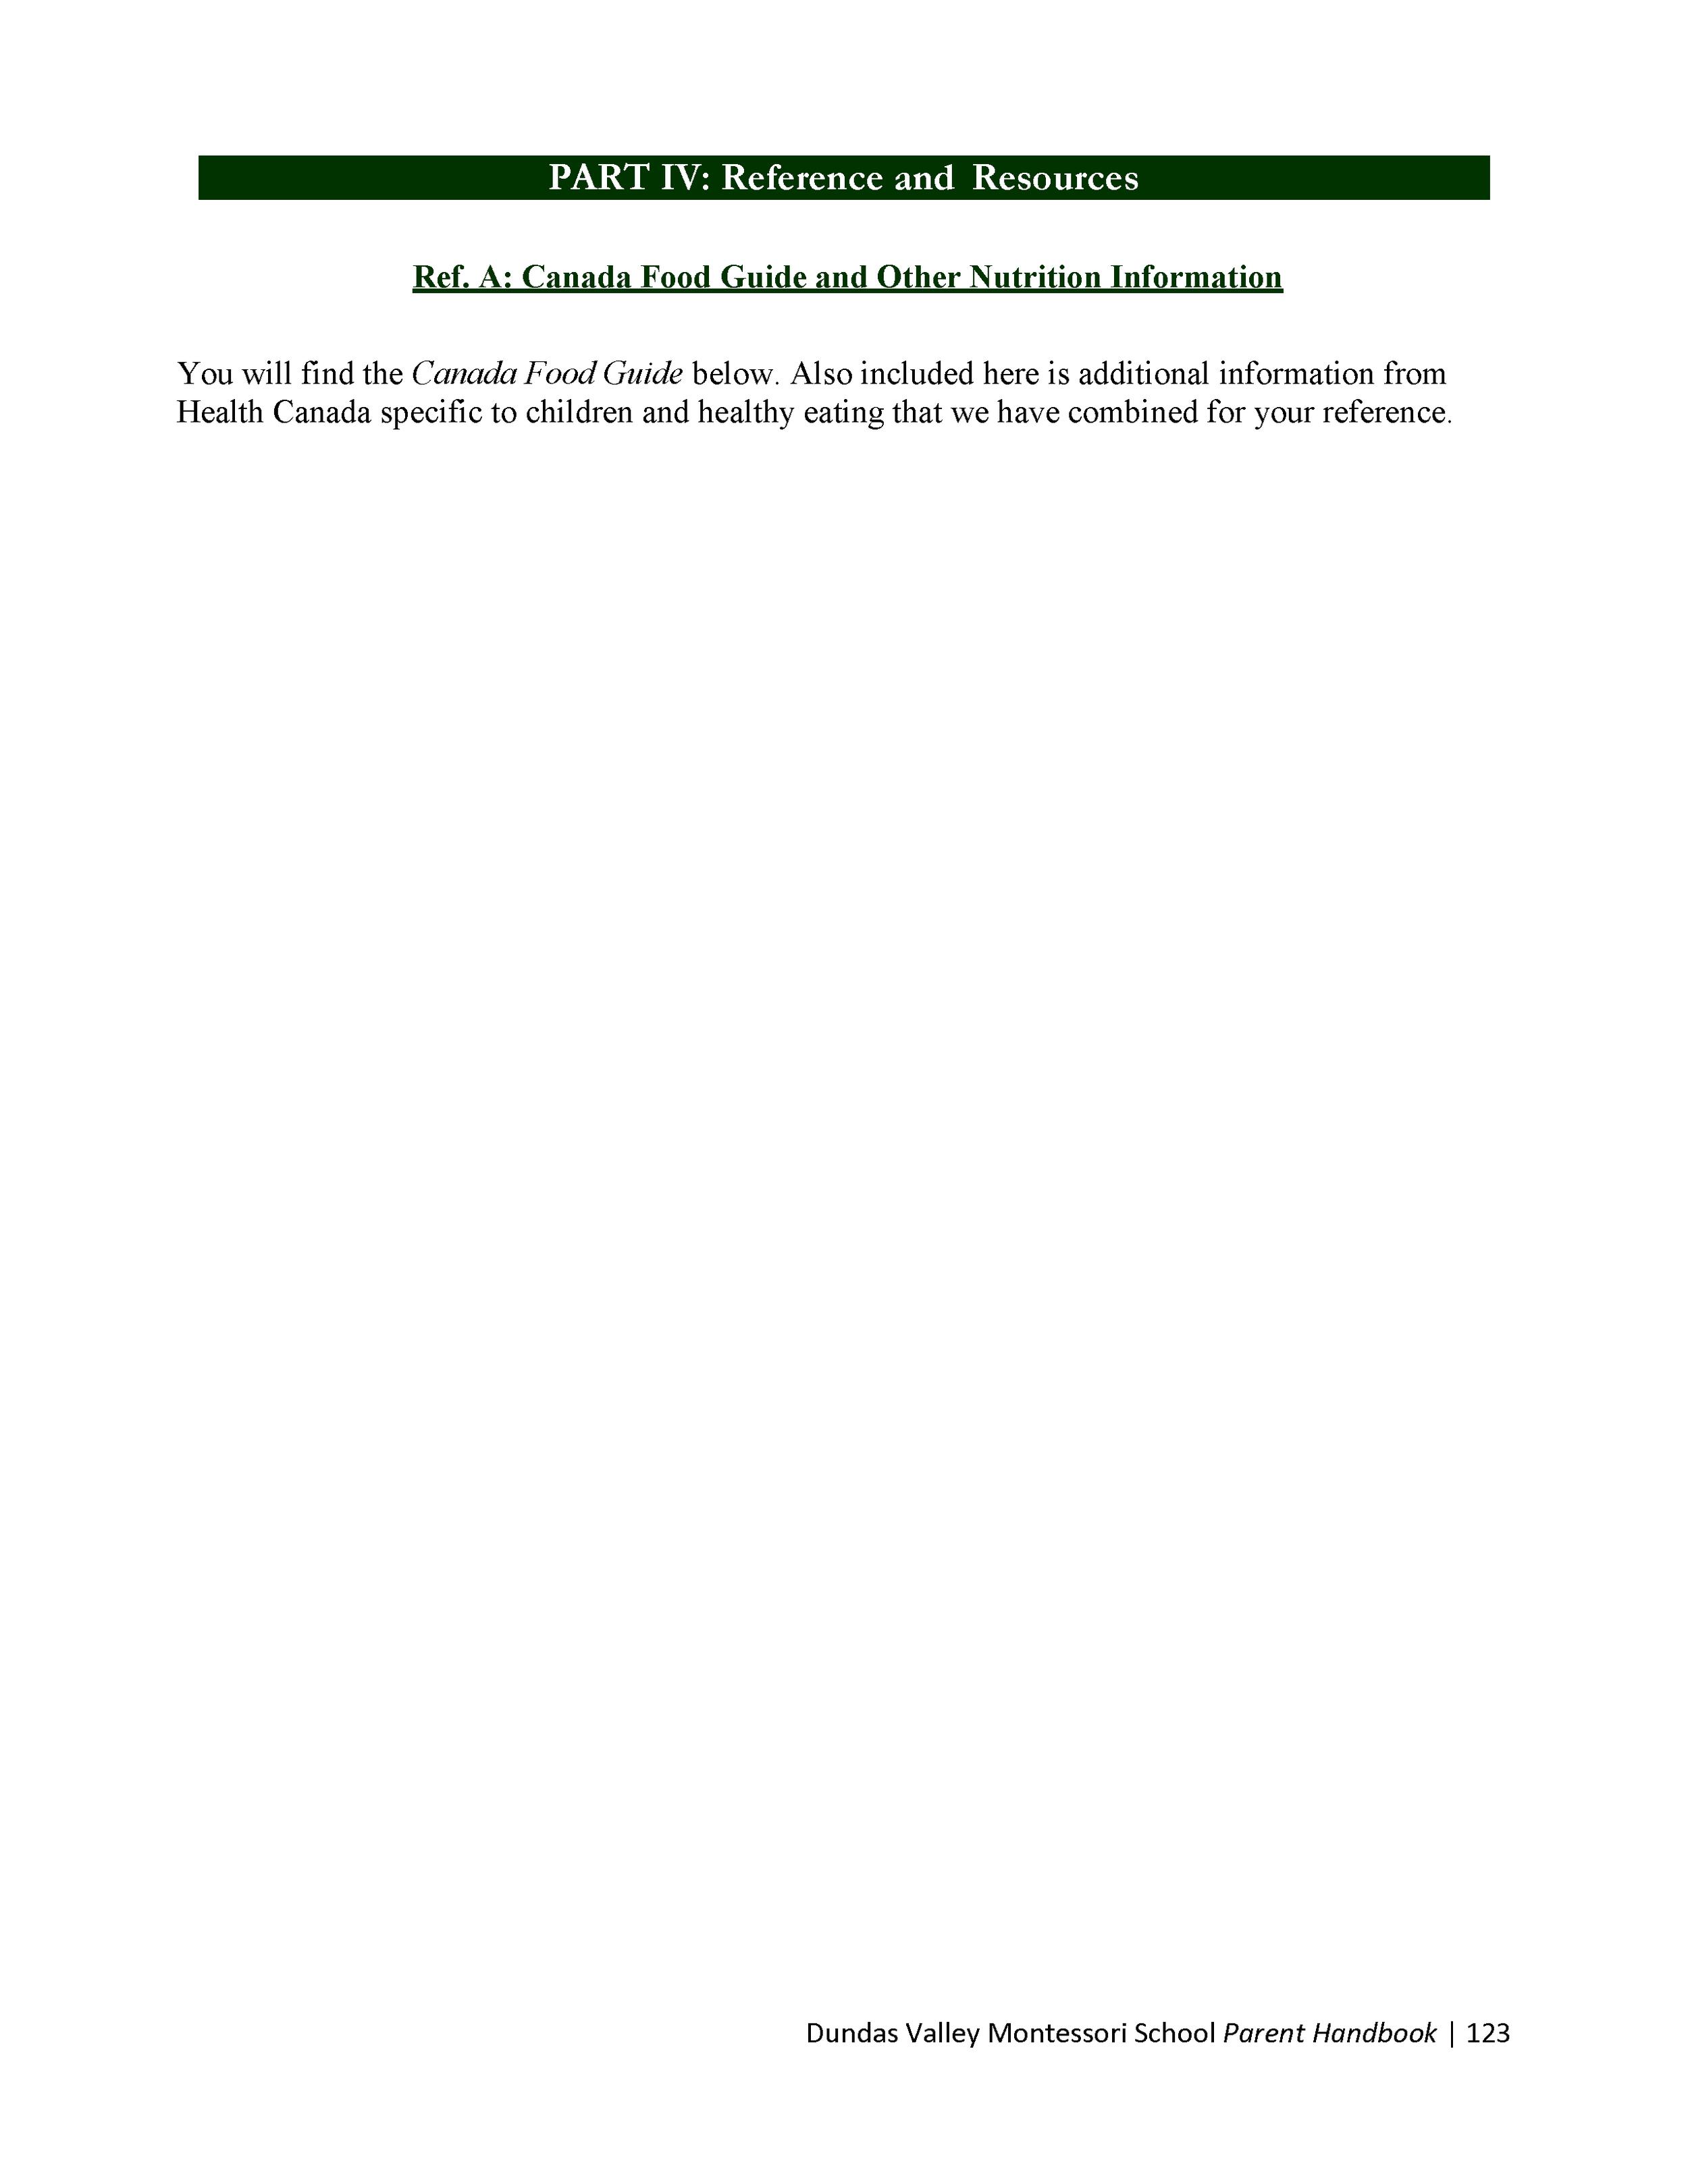 DVMS-Parent-Handbook-19-20_Page_125.png